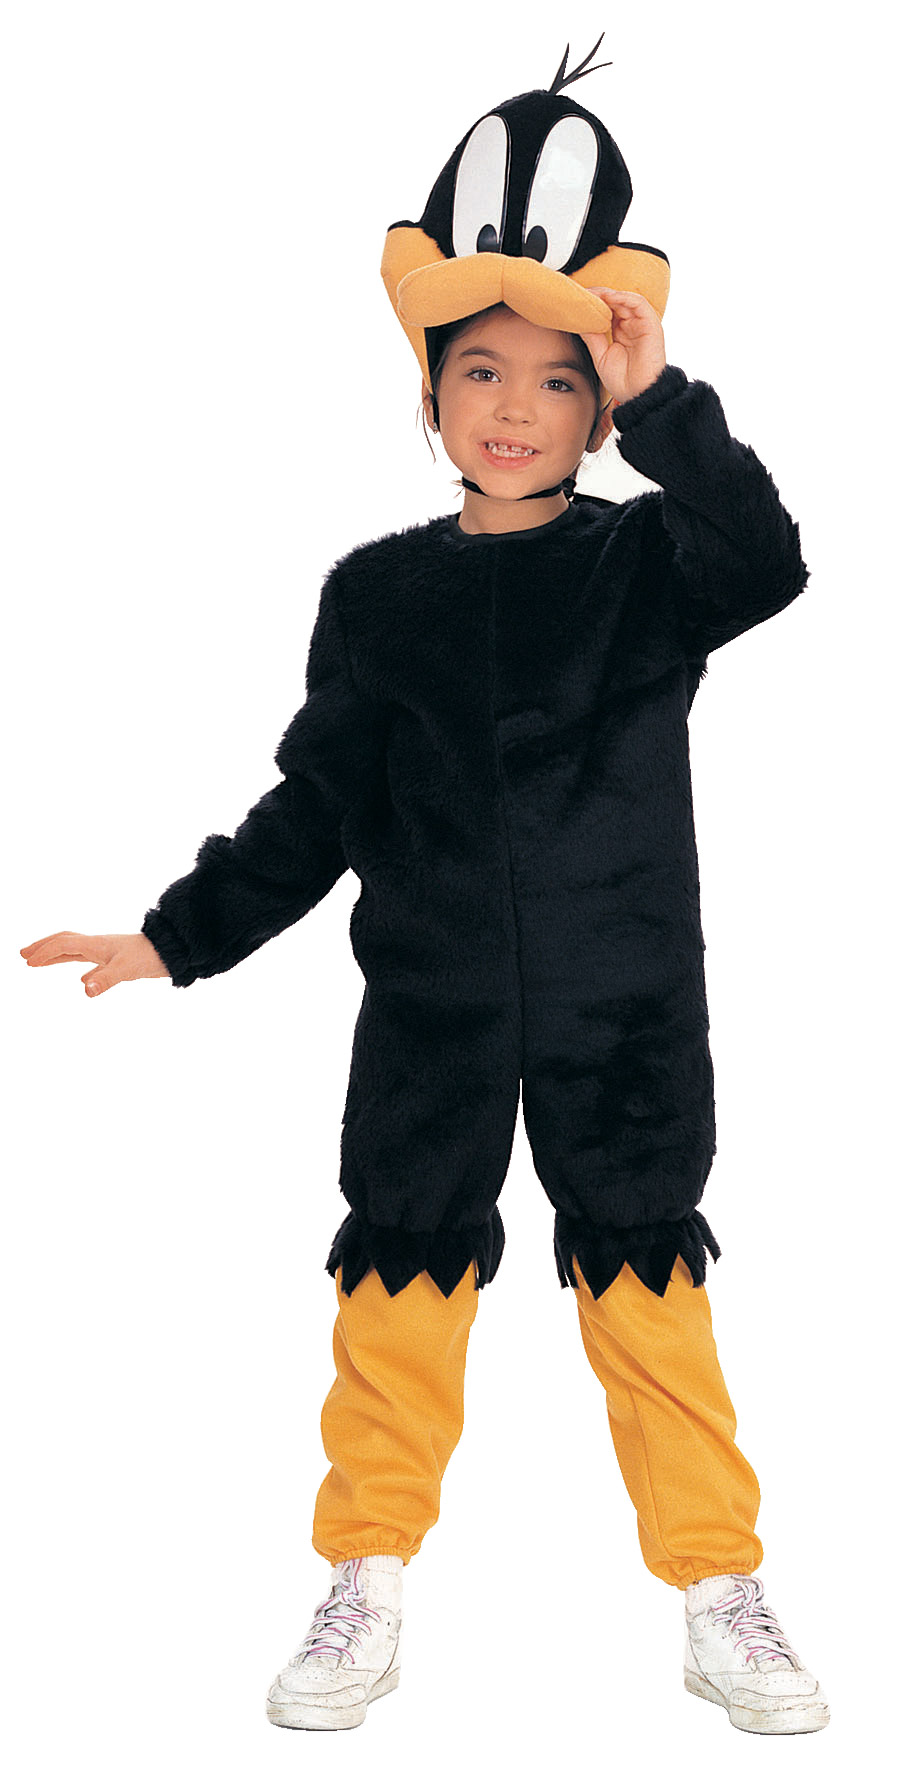 Guisement Daffy Duck Enfant Costume Canard Pas Cher